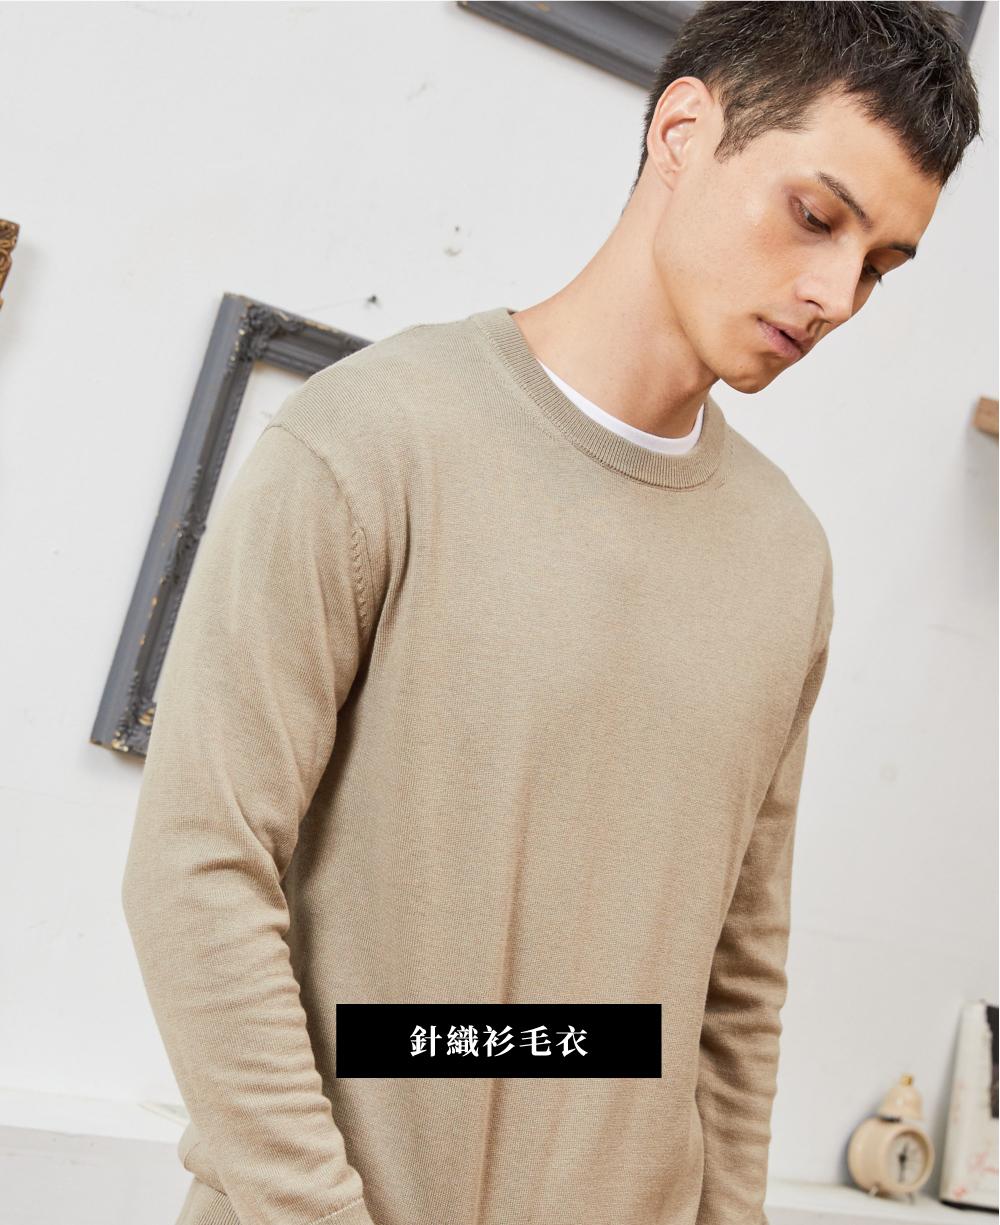 jerscy,最新商品,針織衫毛衣